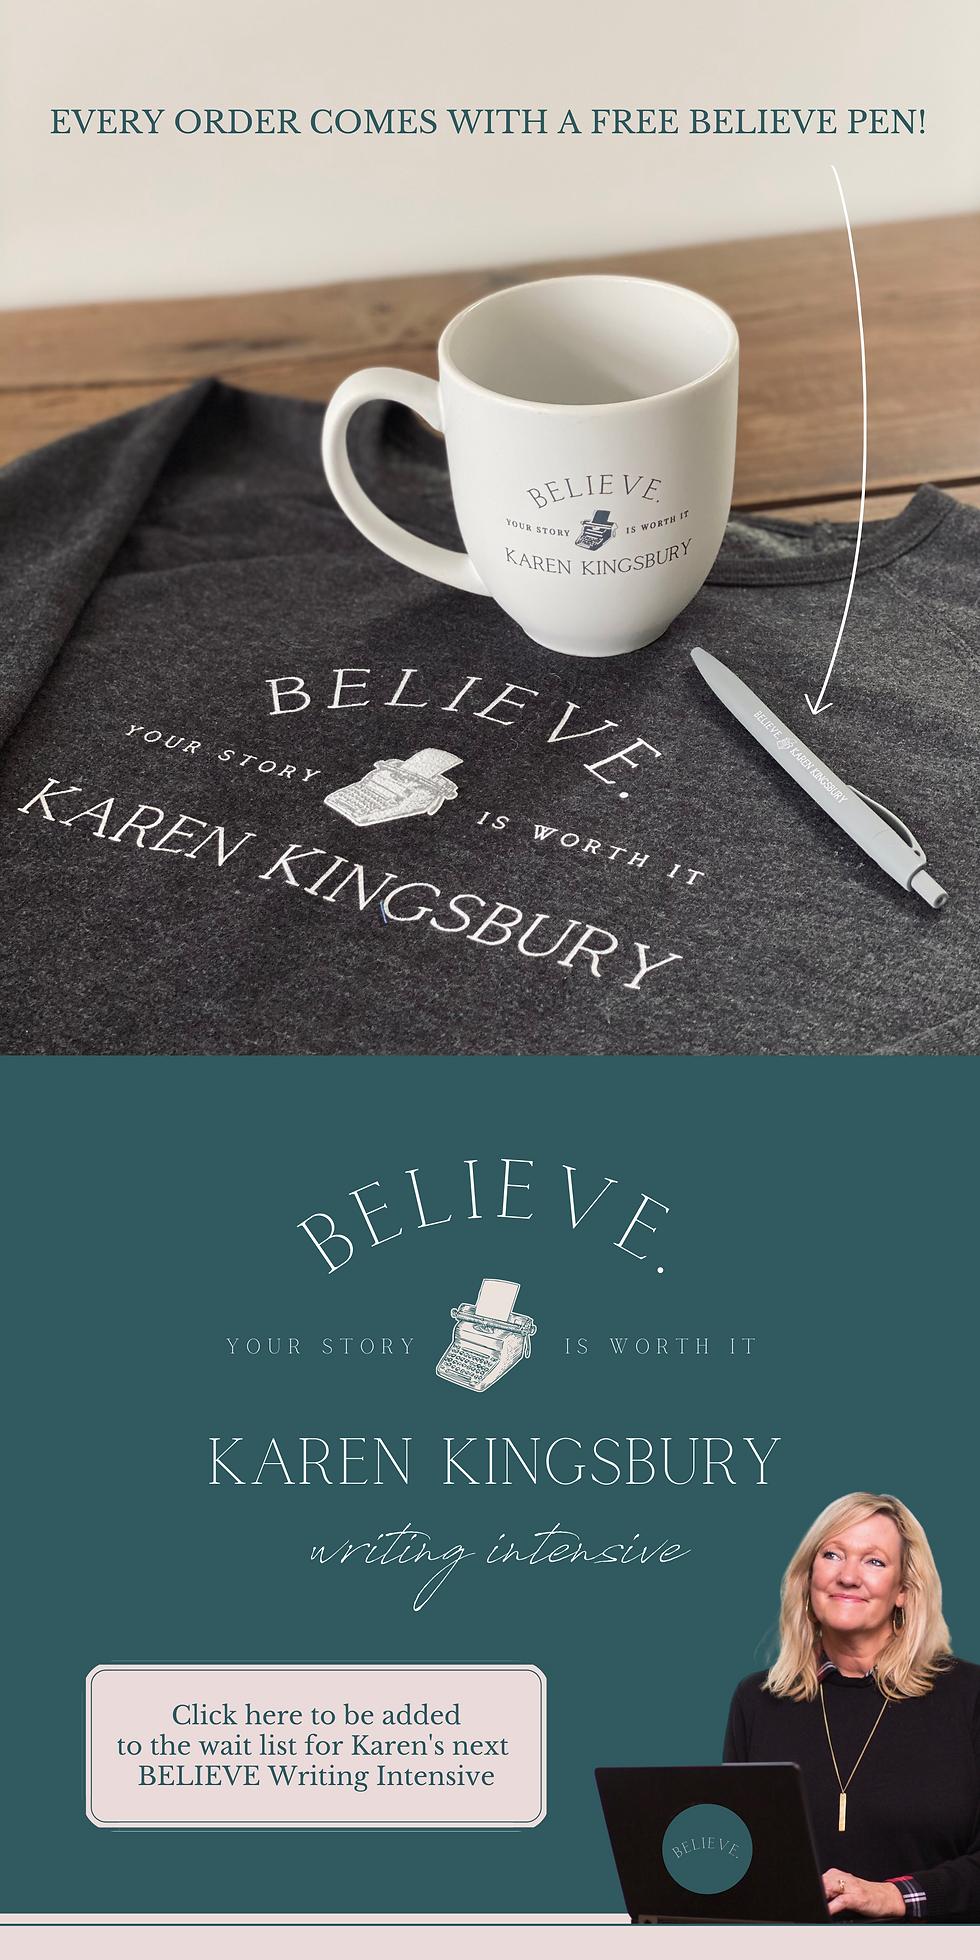 Copy of BELIEVE - Karen Kingsbury Writing Intensive (6).png